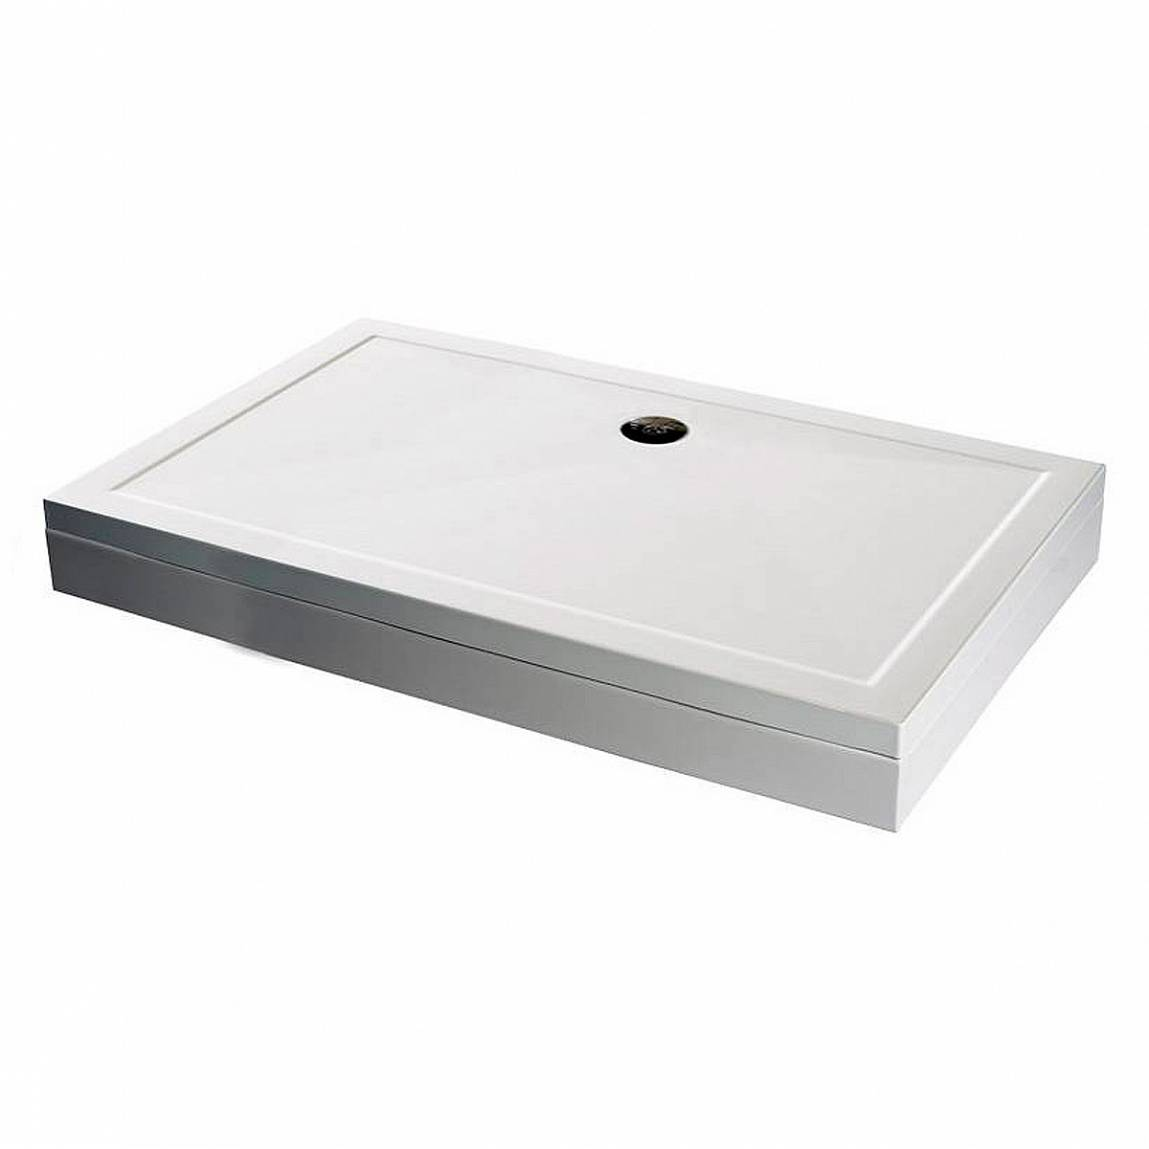 Image of Rectangular Stone Shower Tray & Riser Kit 800 X 700